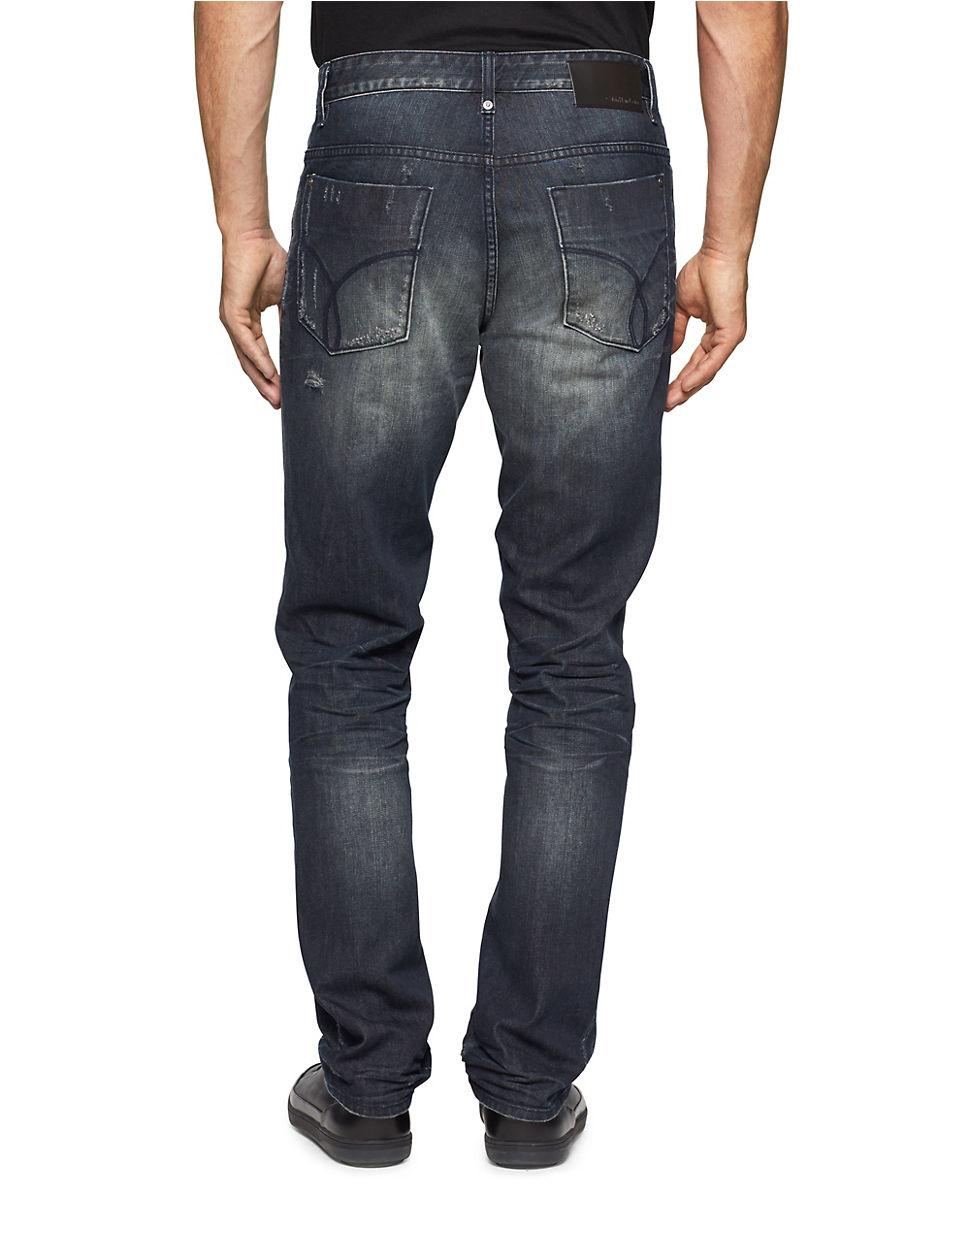 calvin klein jeans slim straight metal jeans in blue for. Black Bedroom Furniture Sets. Home Design Ideas